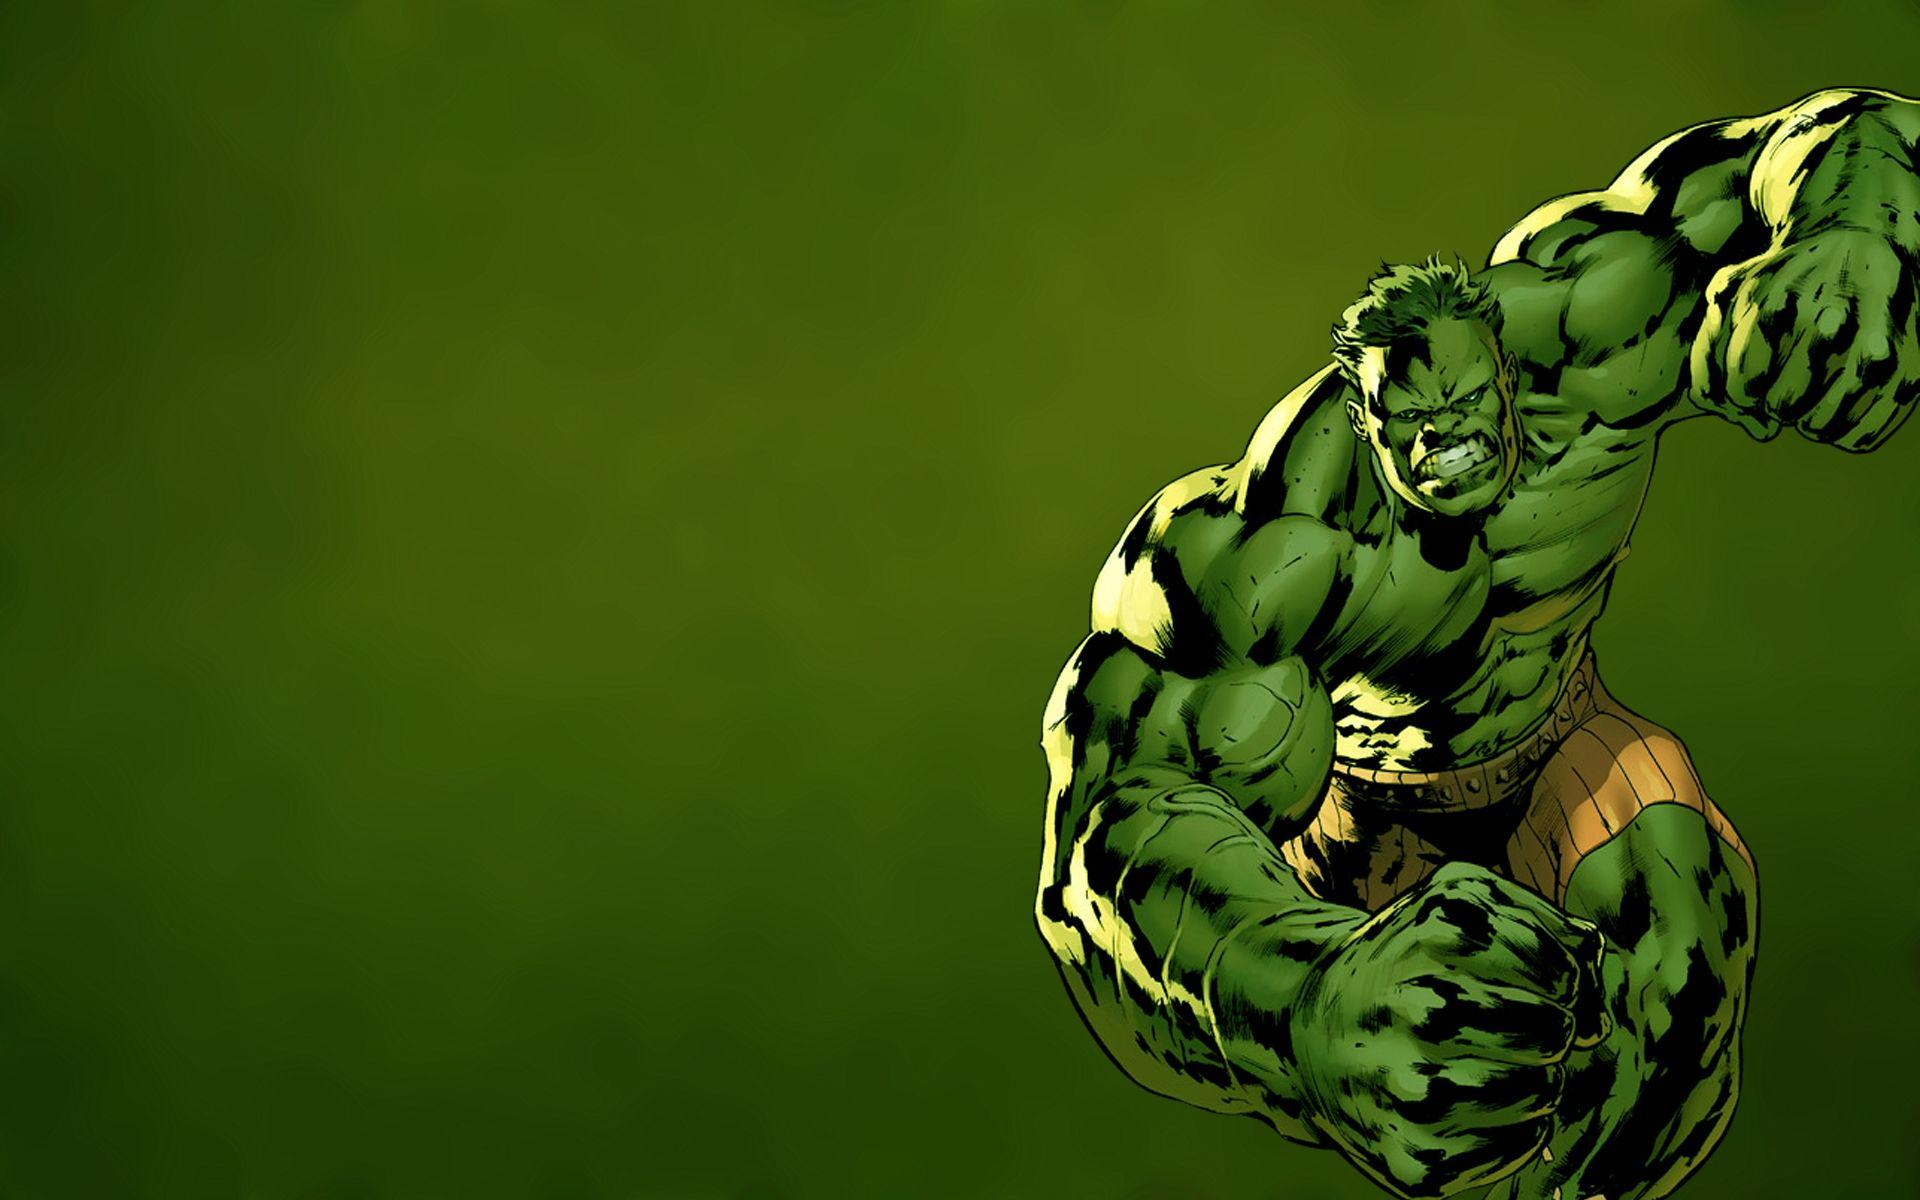 Incredible Hulk Backgrounds For Desktop Hulk The Incredibles Incredible Hulk